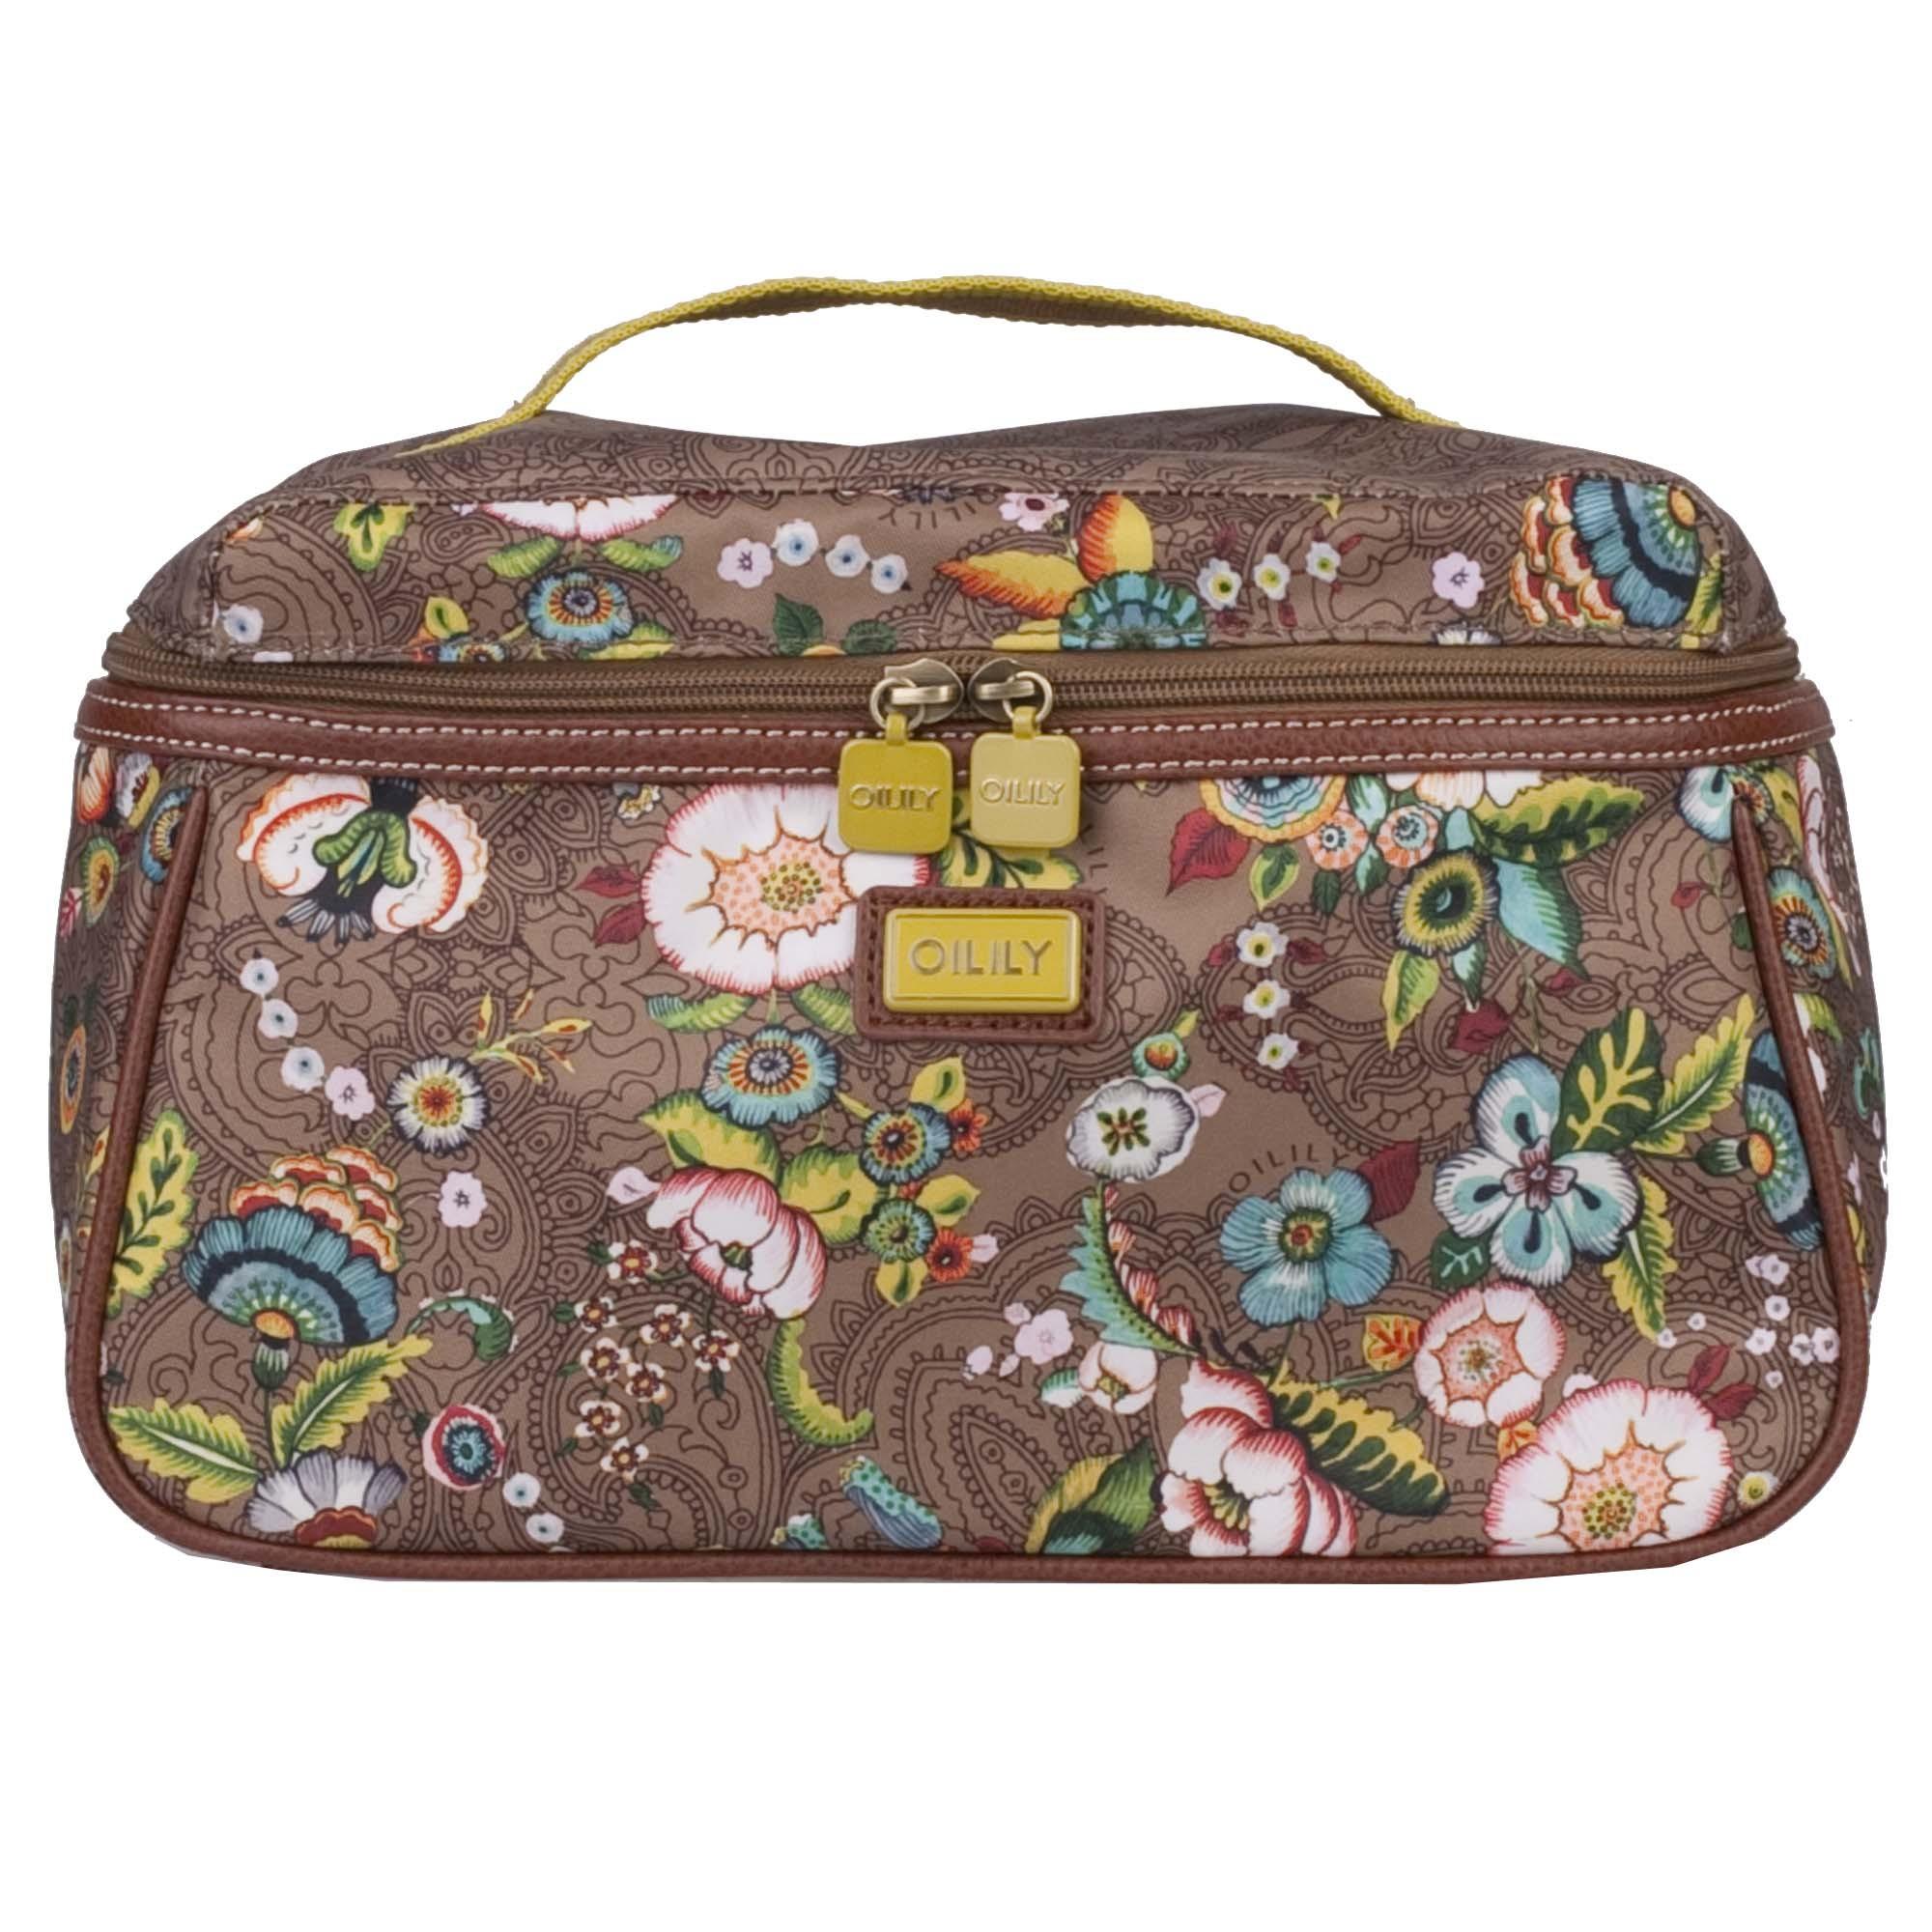 oilily french flowers kosmetiktasche l beauty case in pink grey oder tobacco ebay. Black Bedroom Furniture Sets. Home Design Ideas